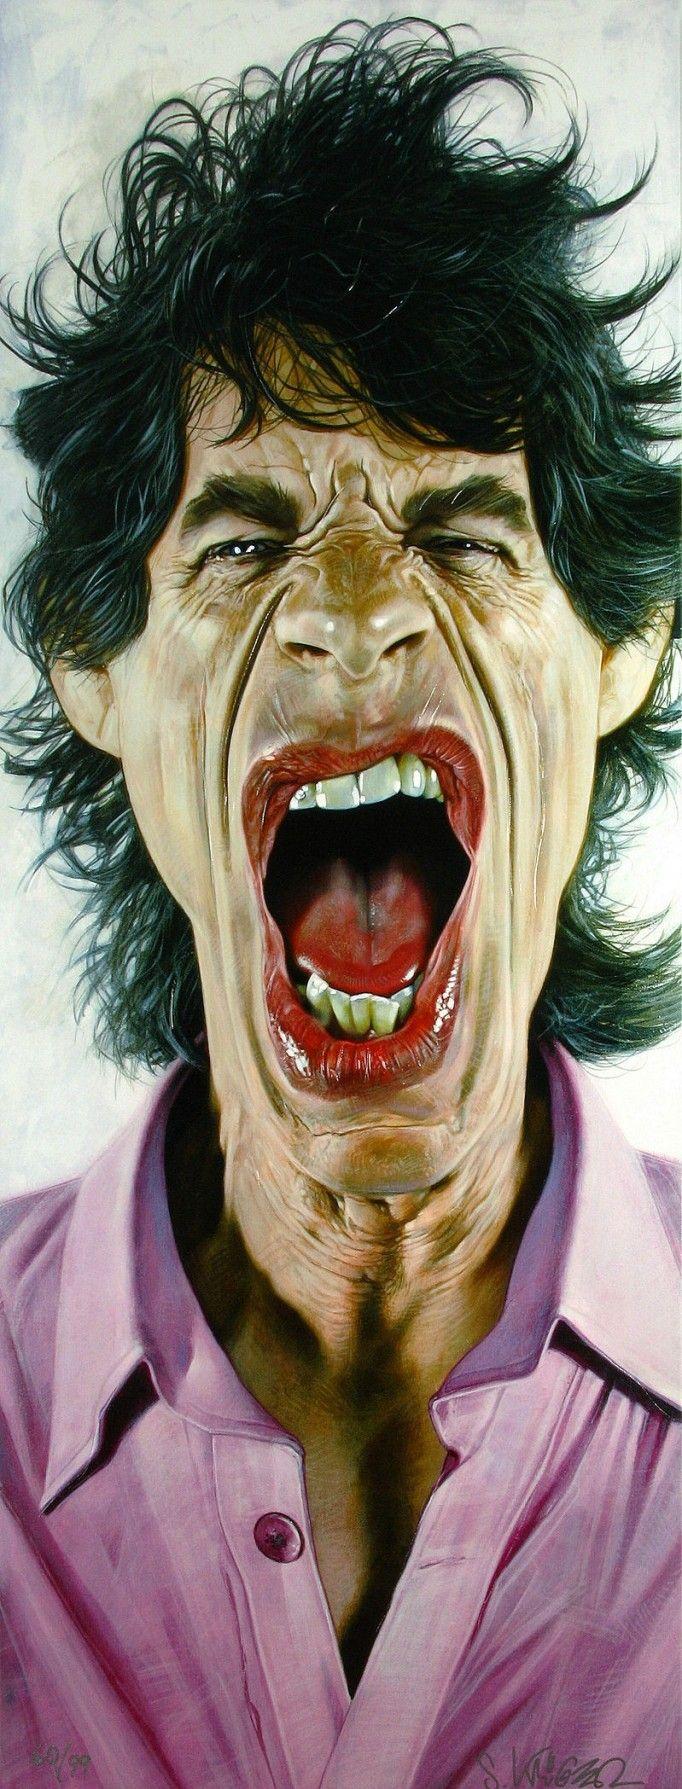 Sebastian Krüger: portraits and caricatures < Guerra Creativa